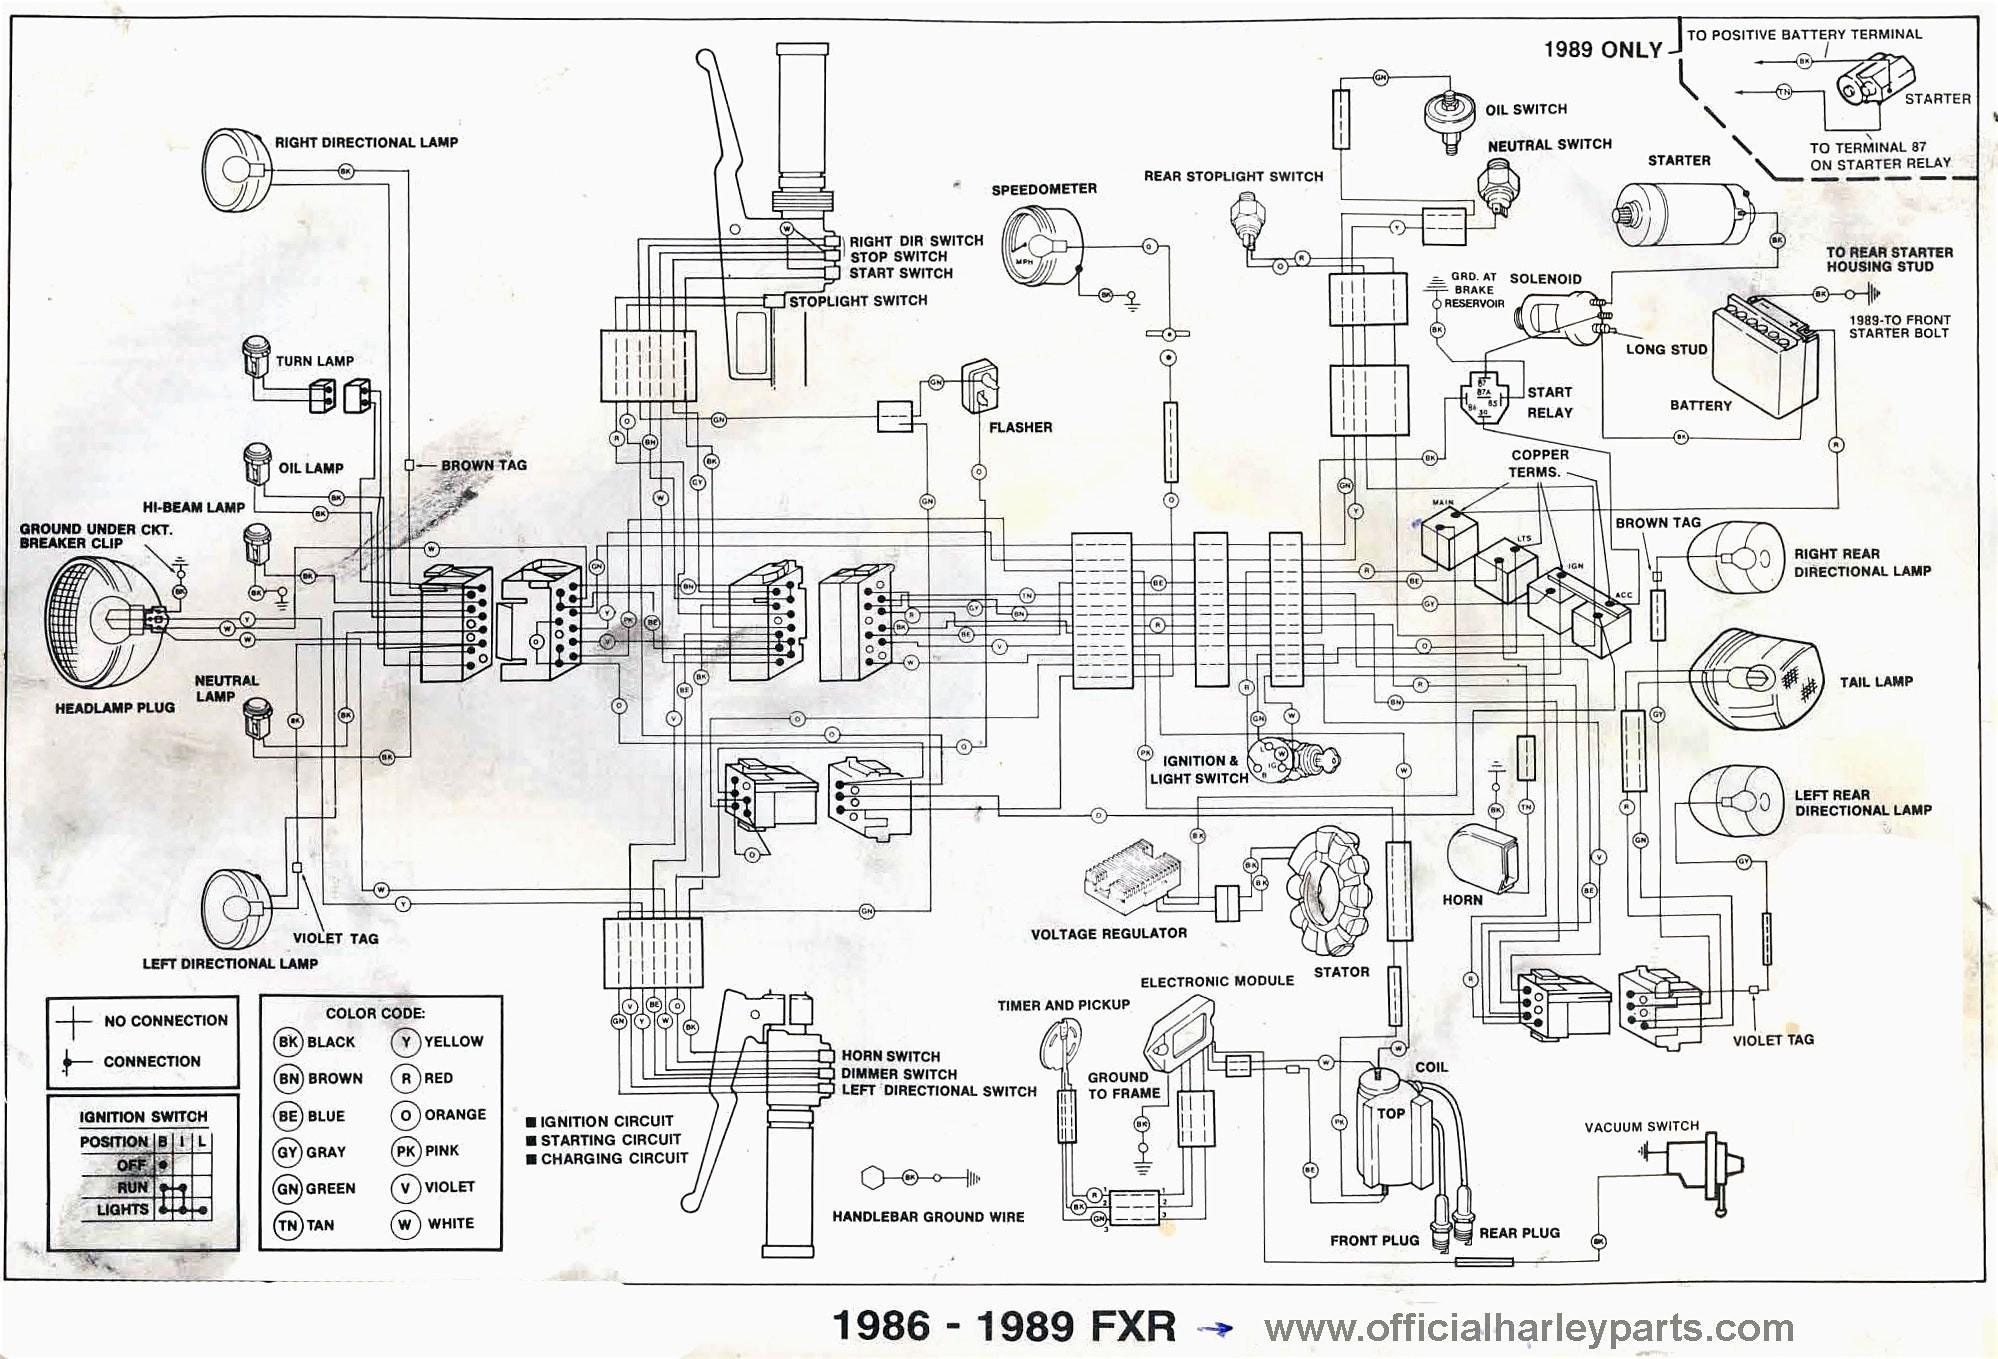 Harley Handlebar Switch Wiring Diagram on 1988 dodge truck wiring diagram, harley-davidson wiring diagram, harley handlebar switch wire, softail coil wiring diagram, lighting control panel wiring diagram,